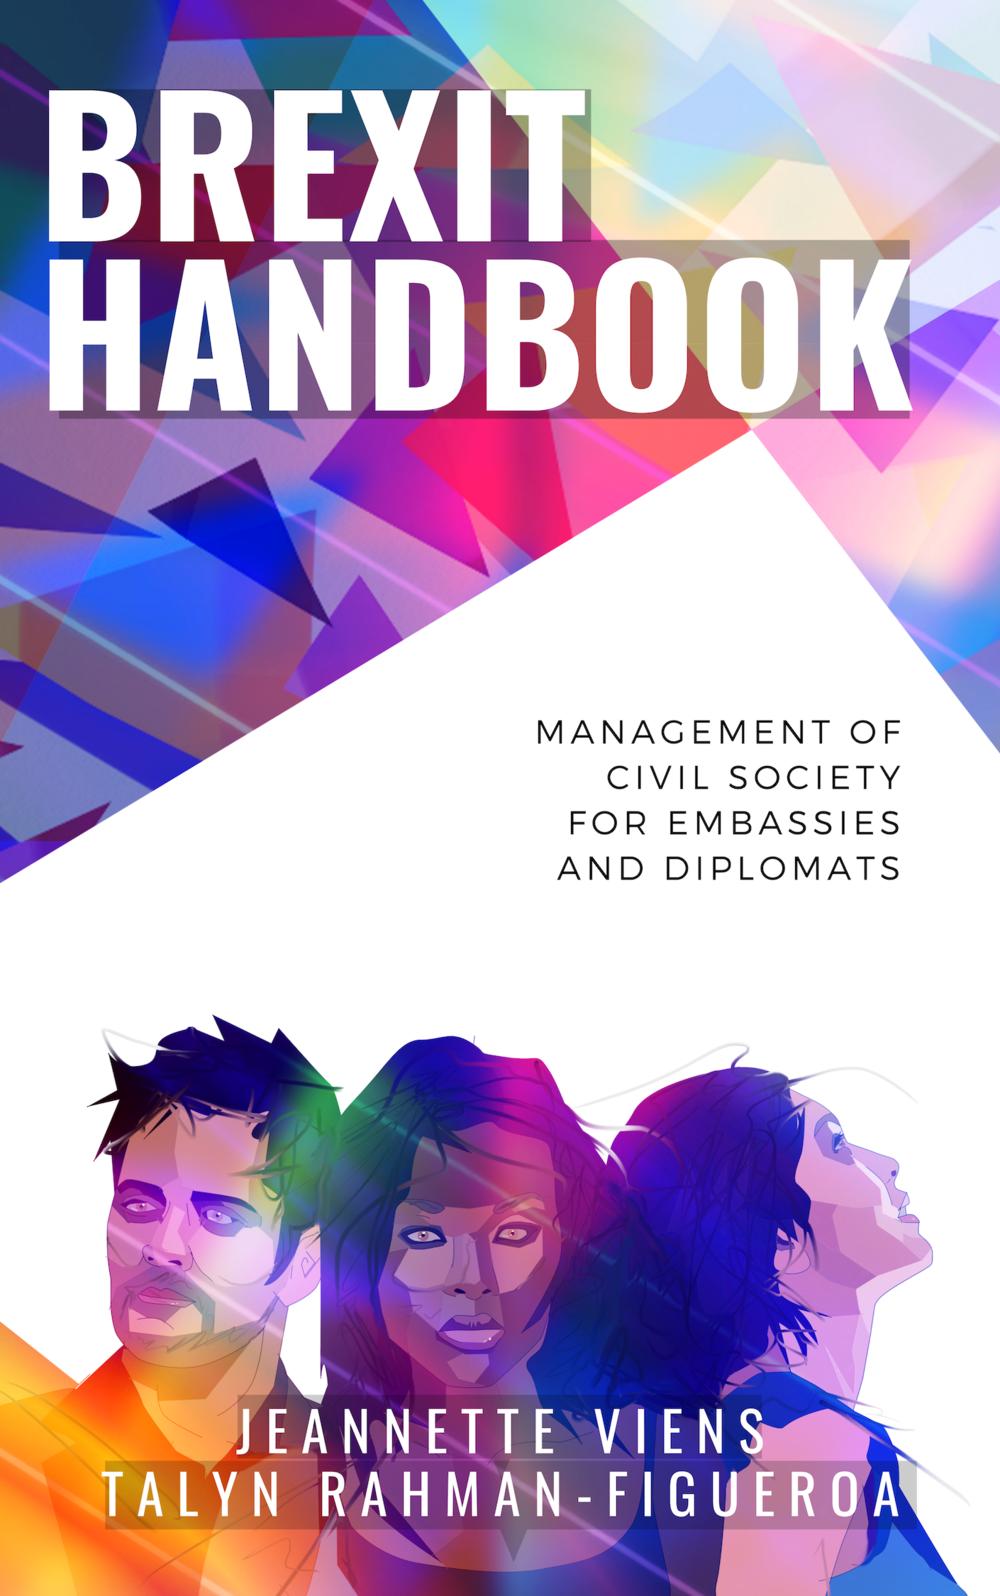 Brexit Handbook Cover V1.2.png